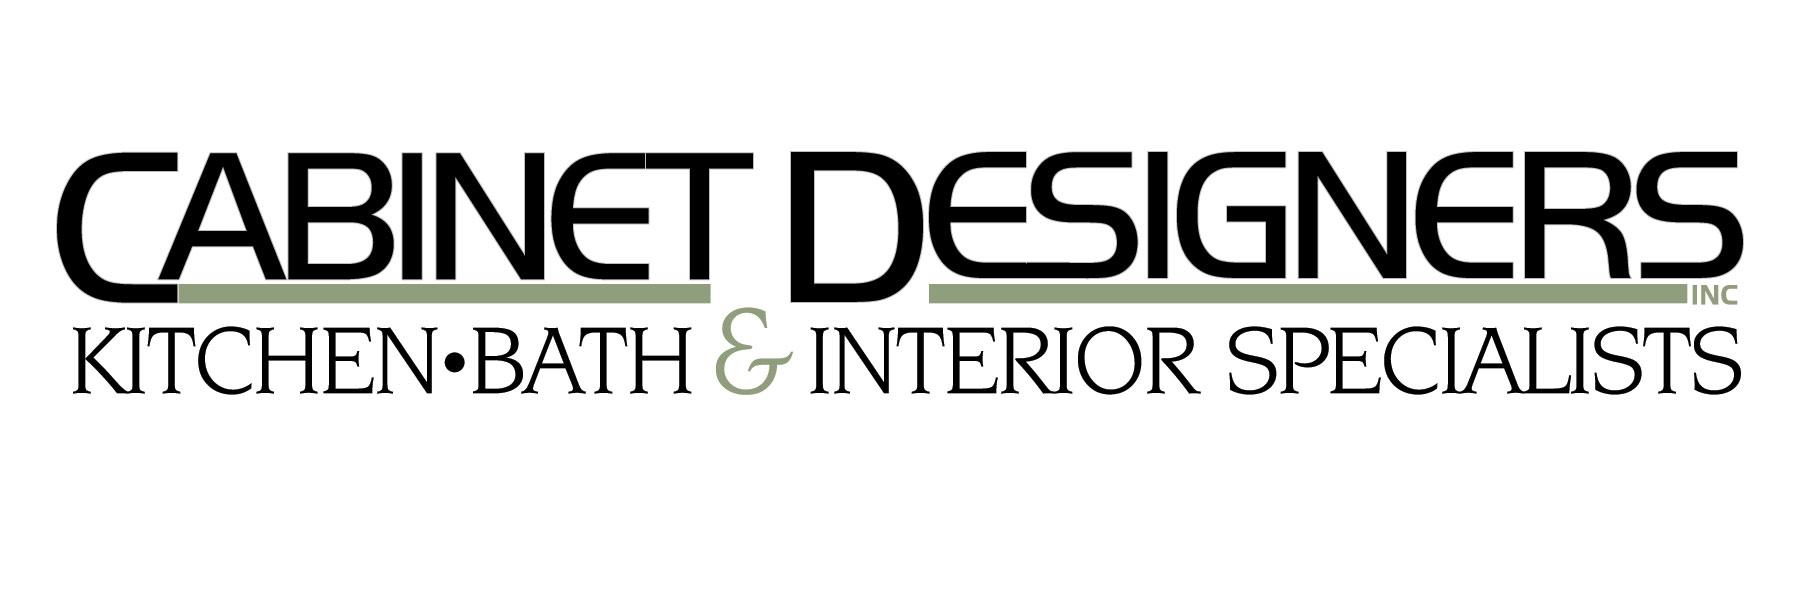 Cabinet Designers header 2